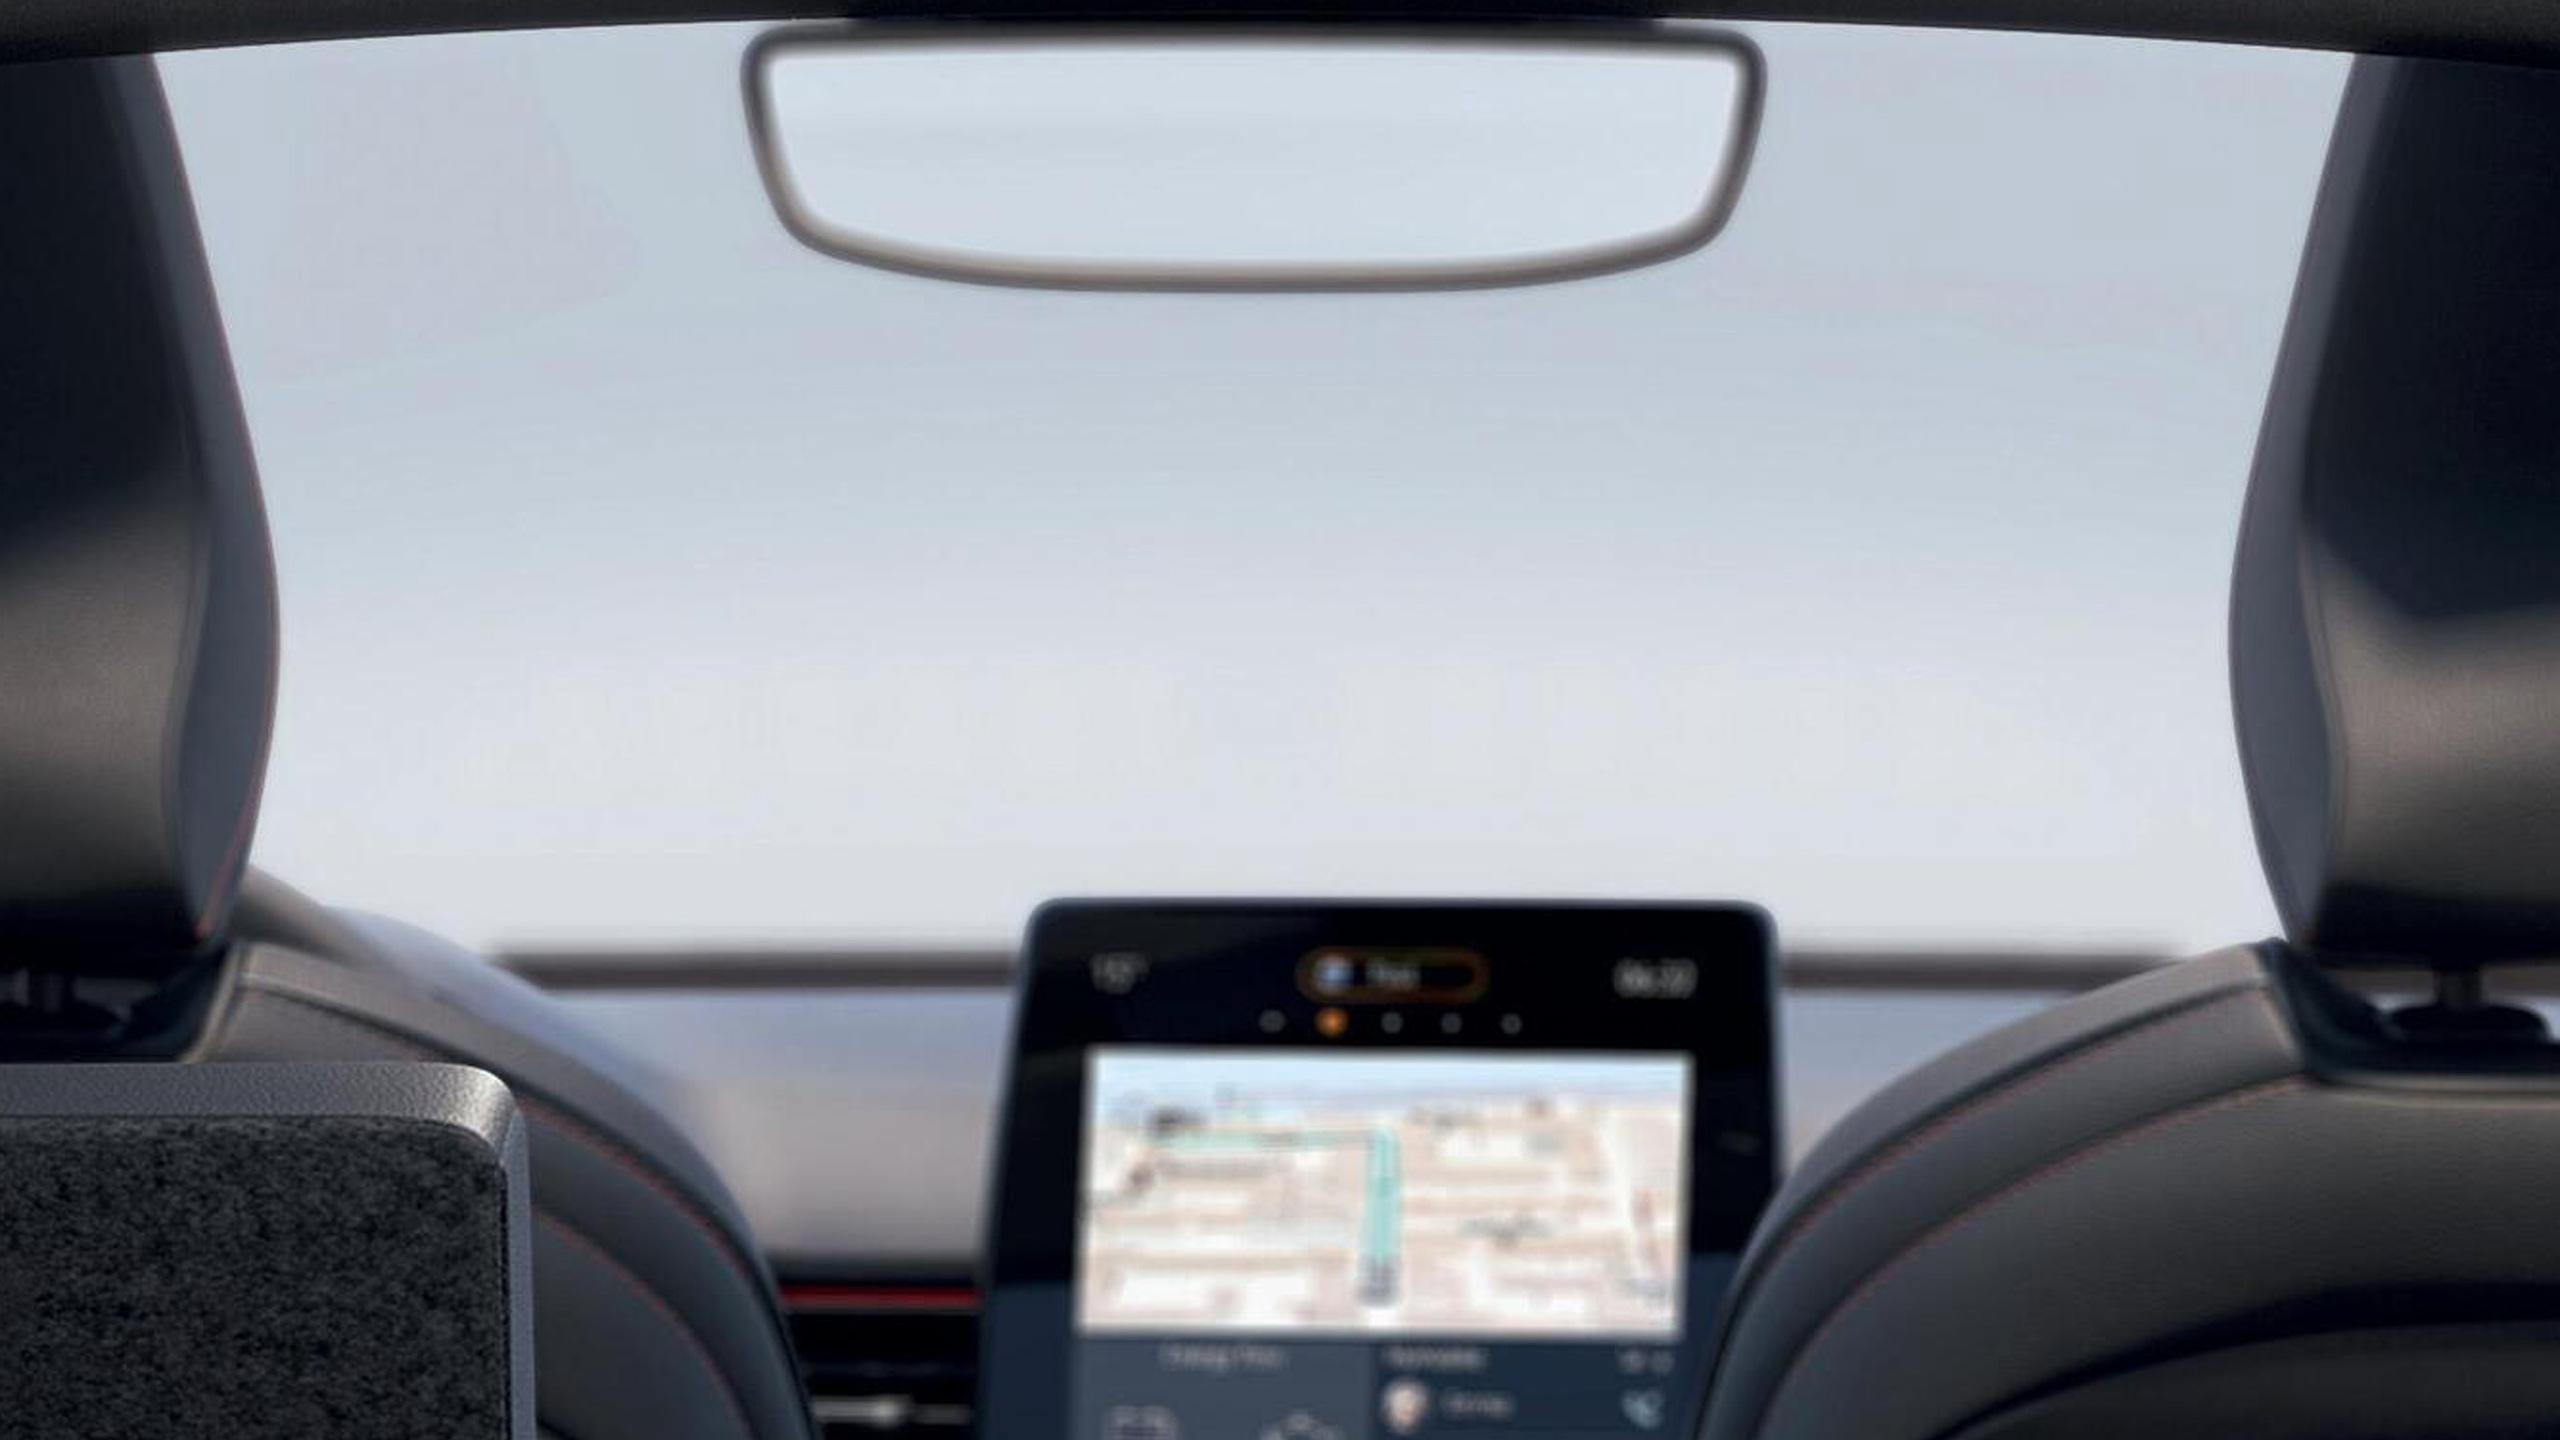 Auto dazzling Rear View Mirror